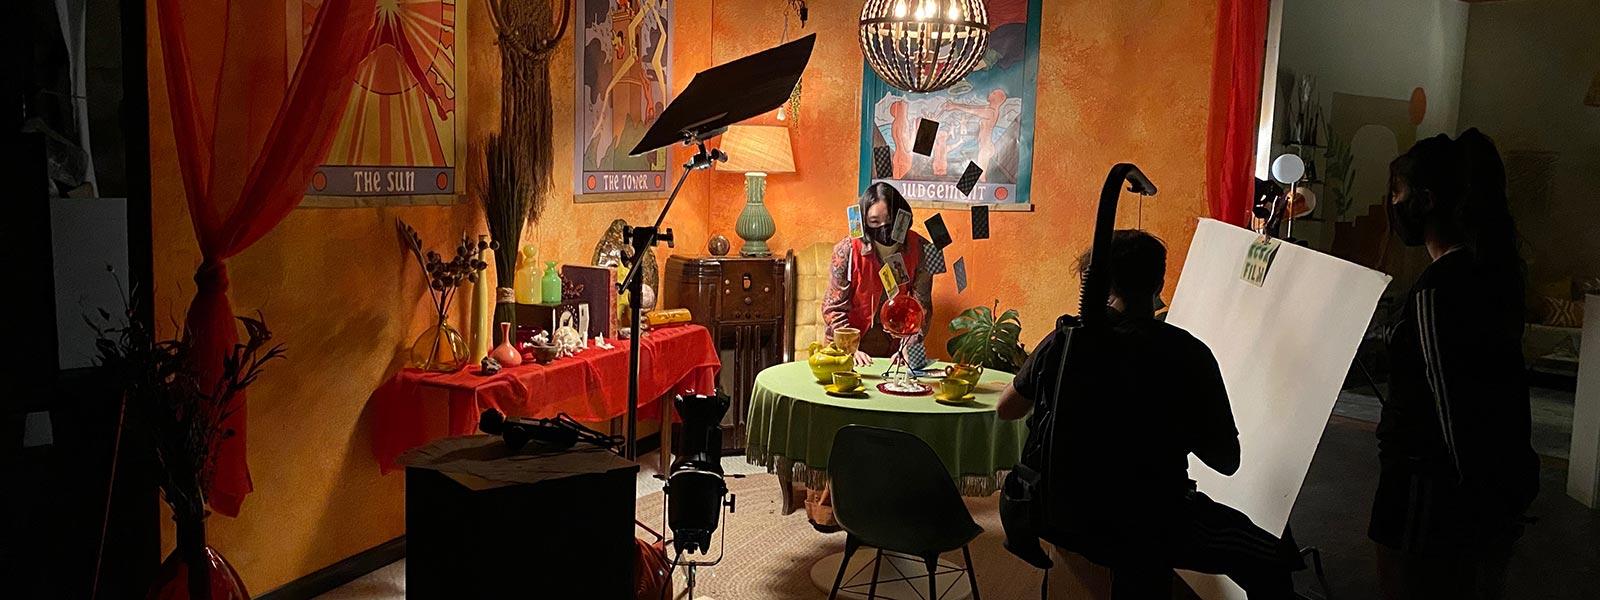 """Red Room"" was filmed on Wes Cowen's 60s-inspired Tarot card reader set."